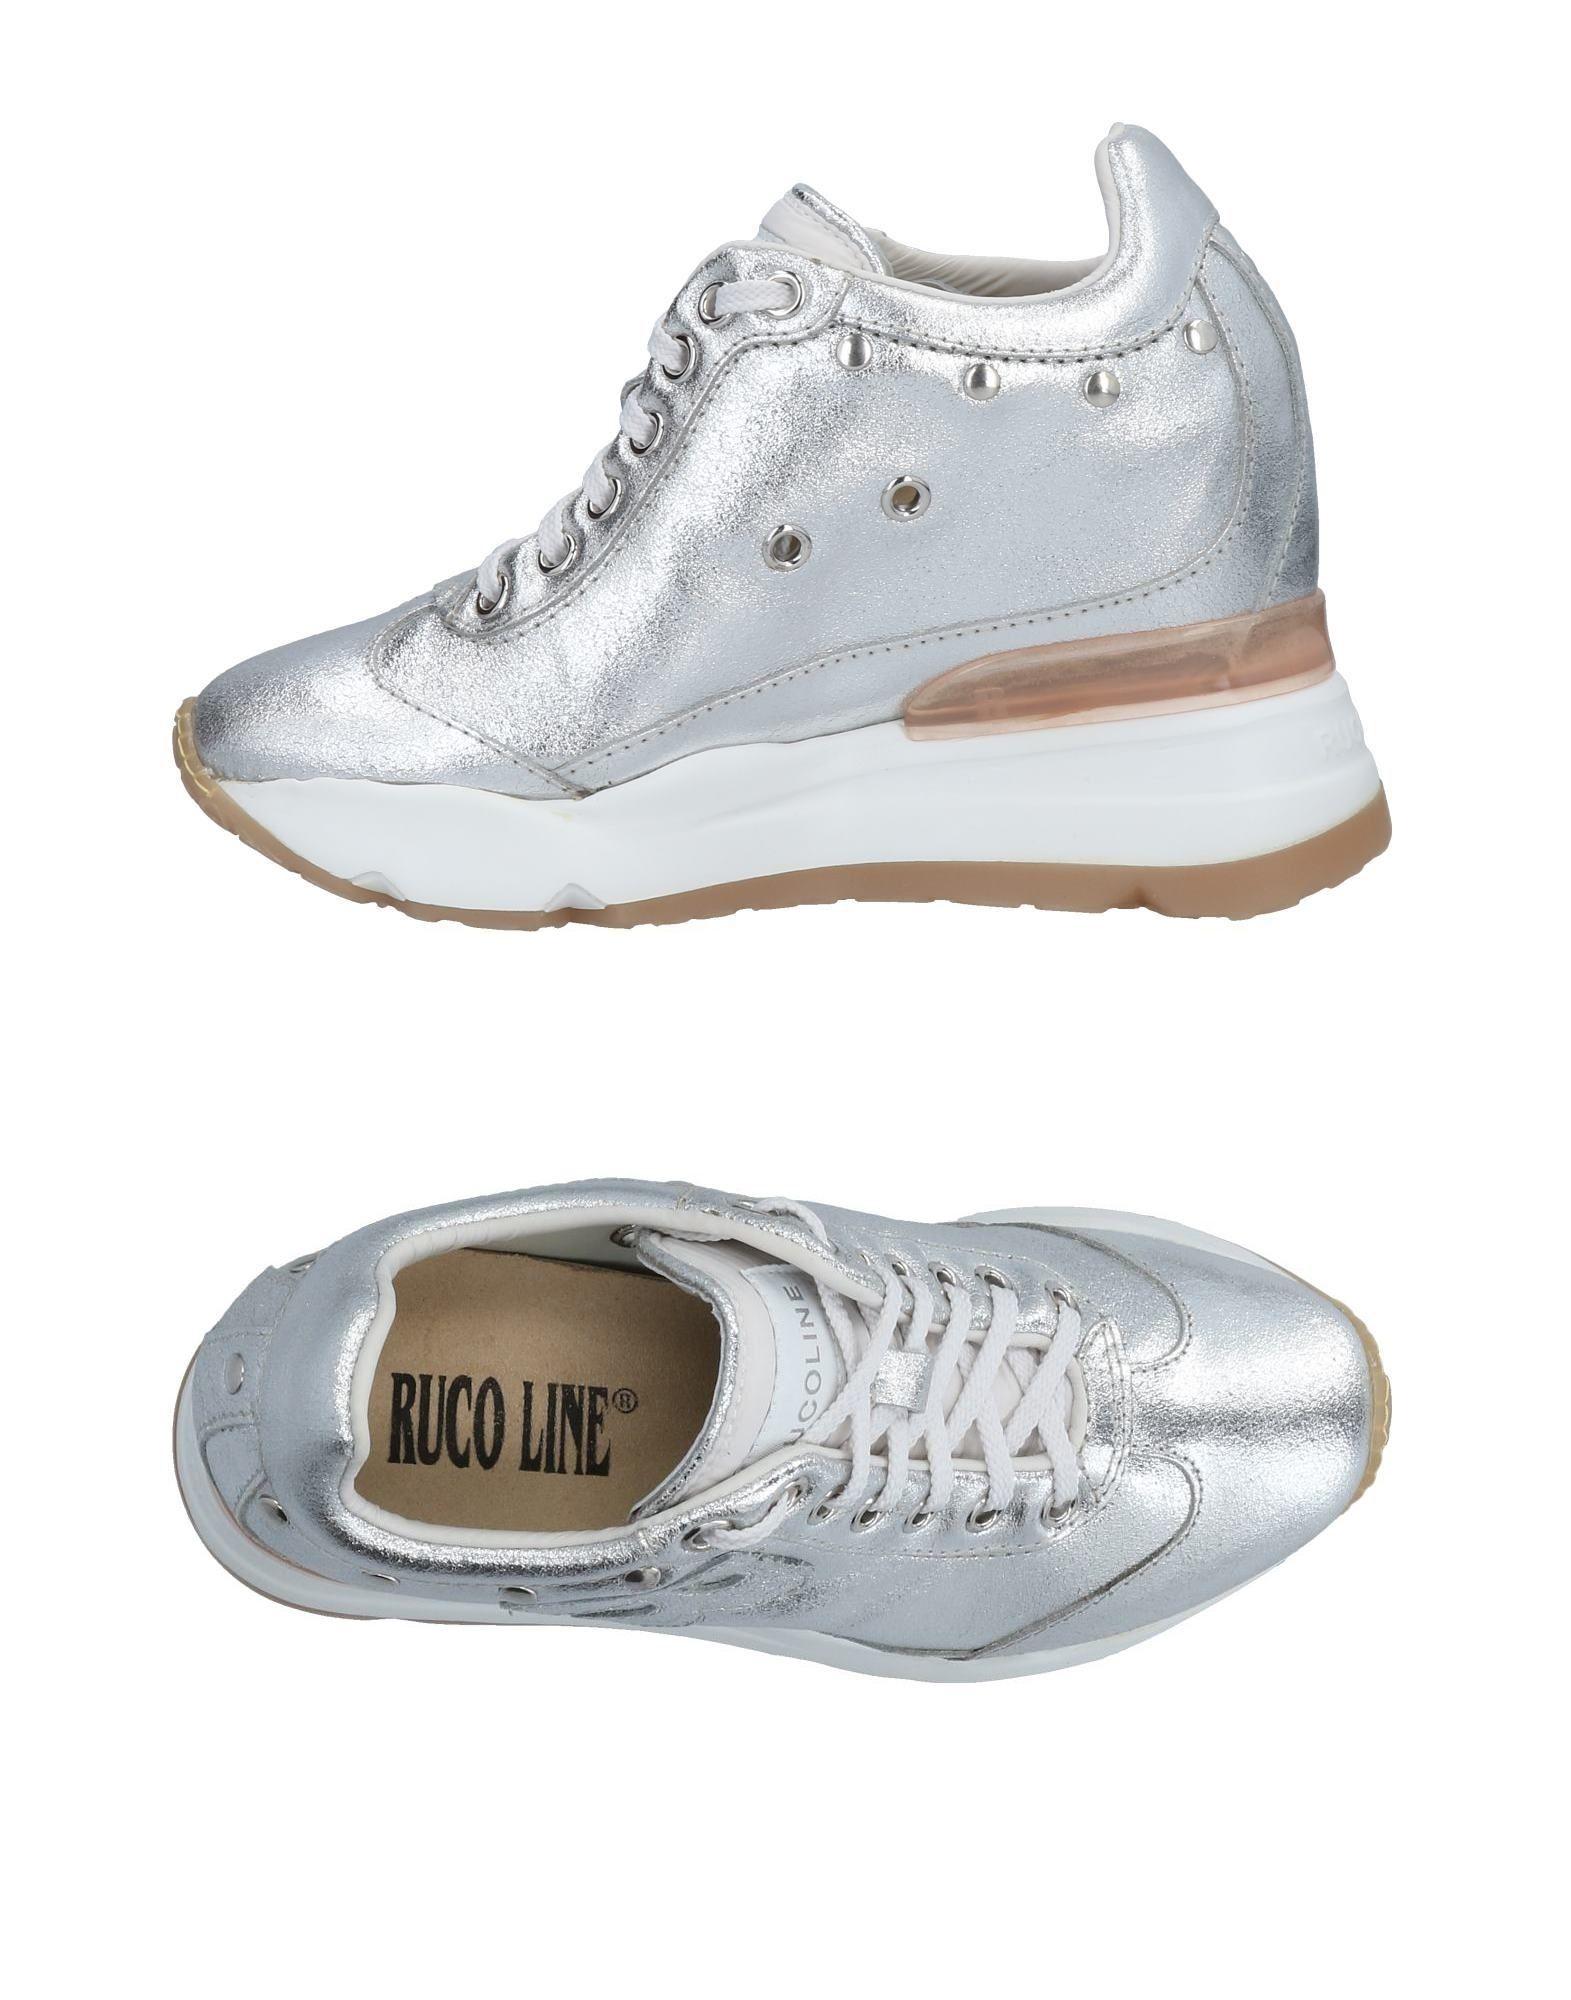 Stilvolle billige Schuhe Ruco Line Sneakers Damen  11492248XJ